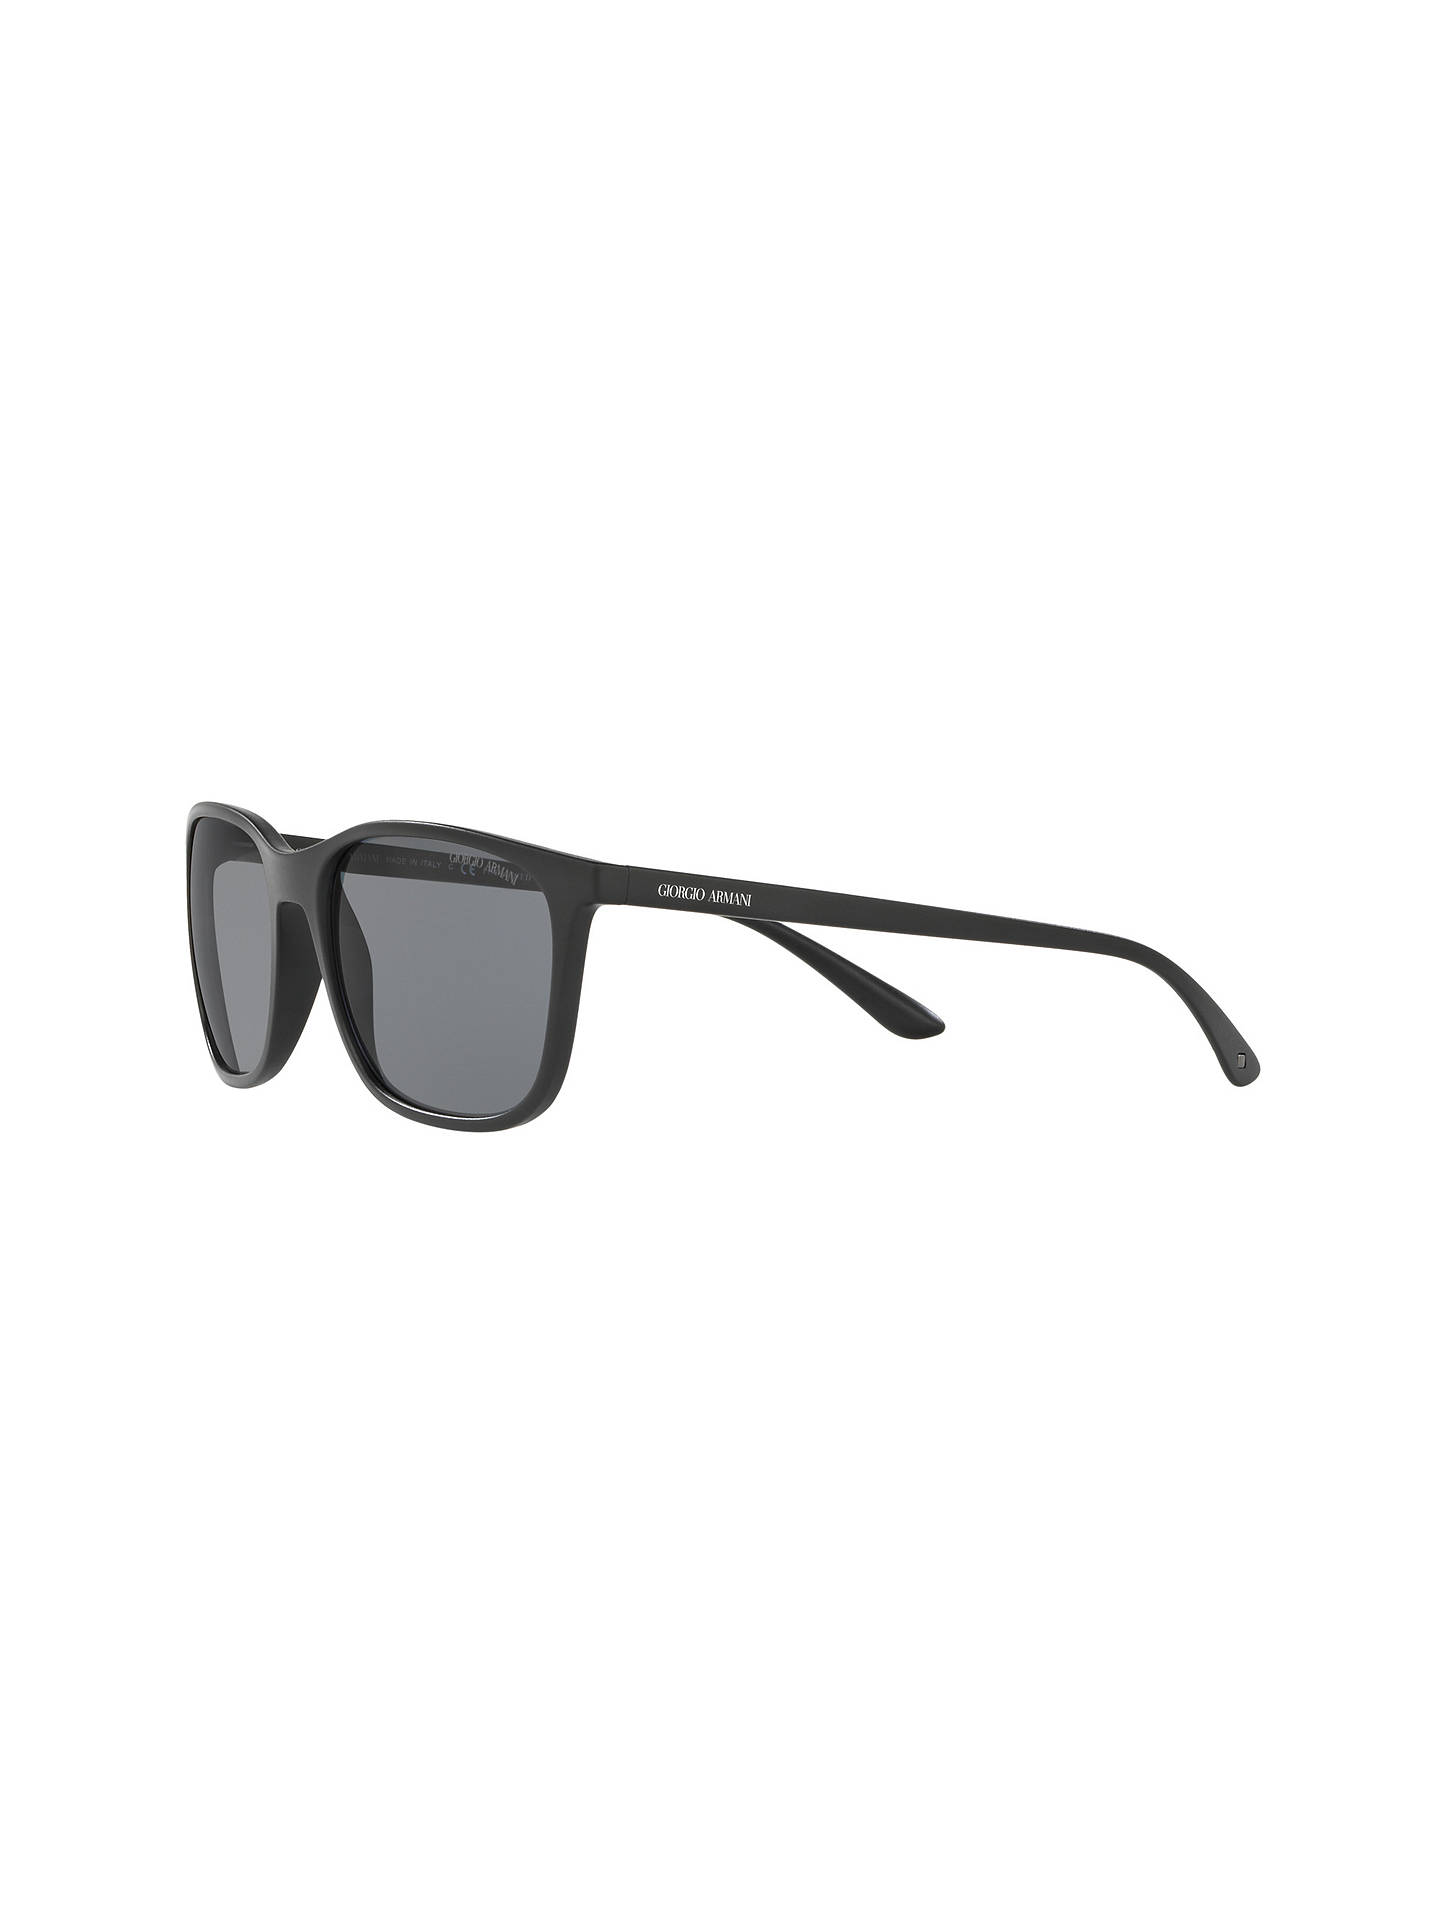 3ec761f1b6c Giorgio Armani AR8084 Polarised Square Sunglasses at John Lewis ...